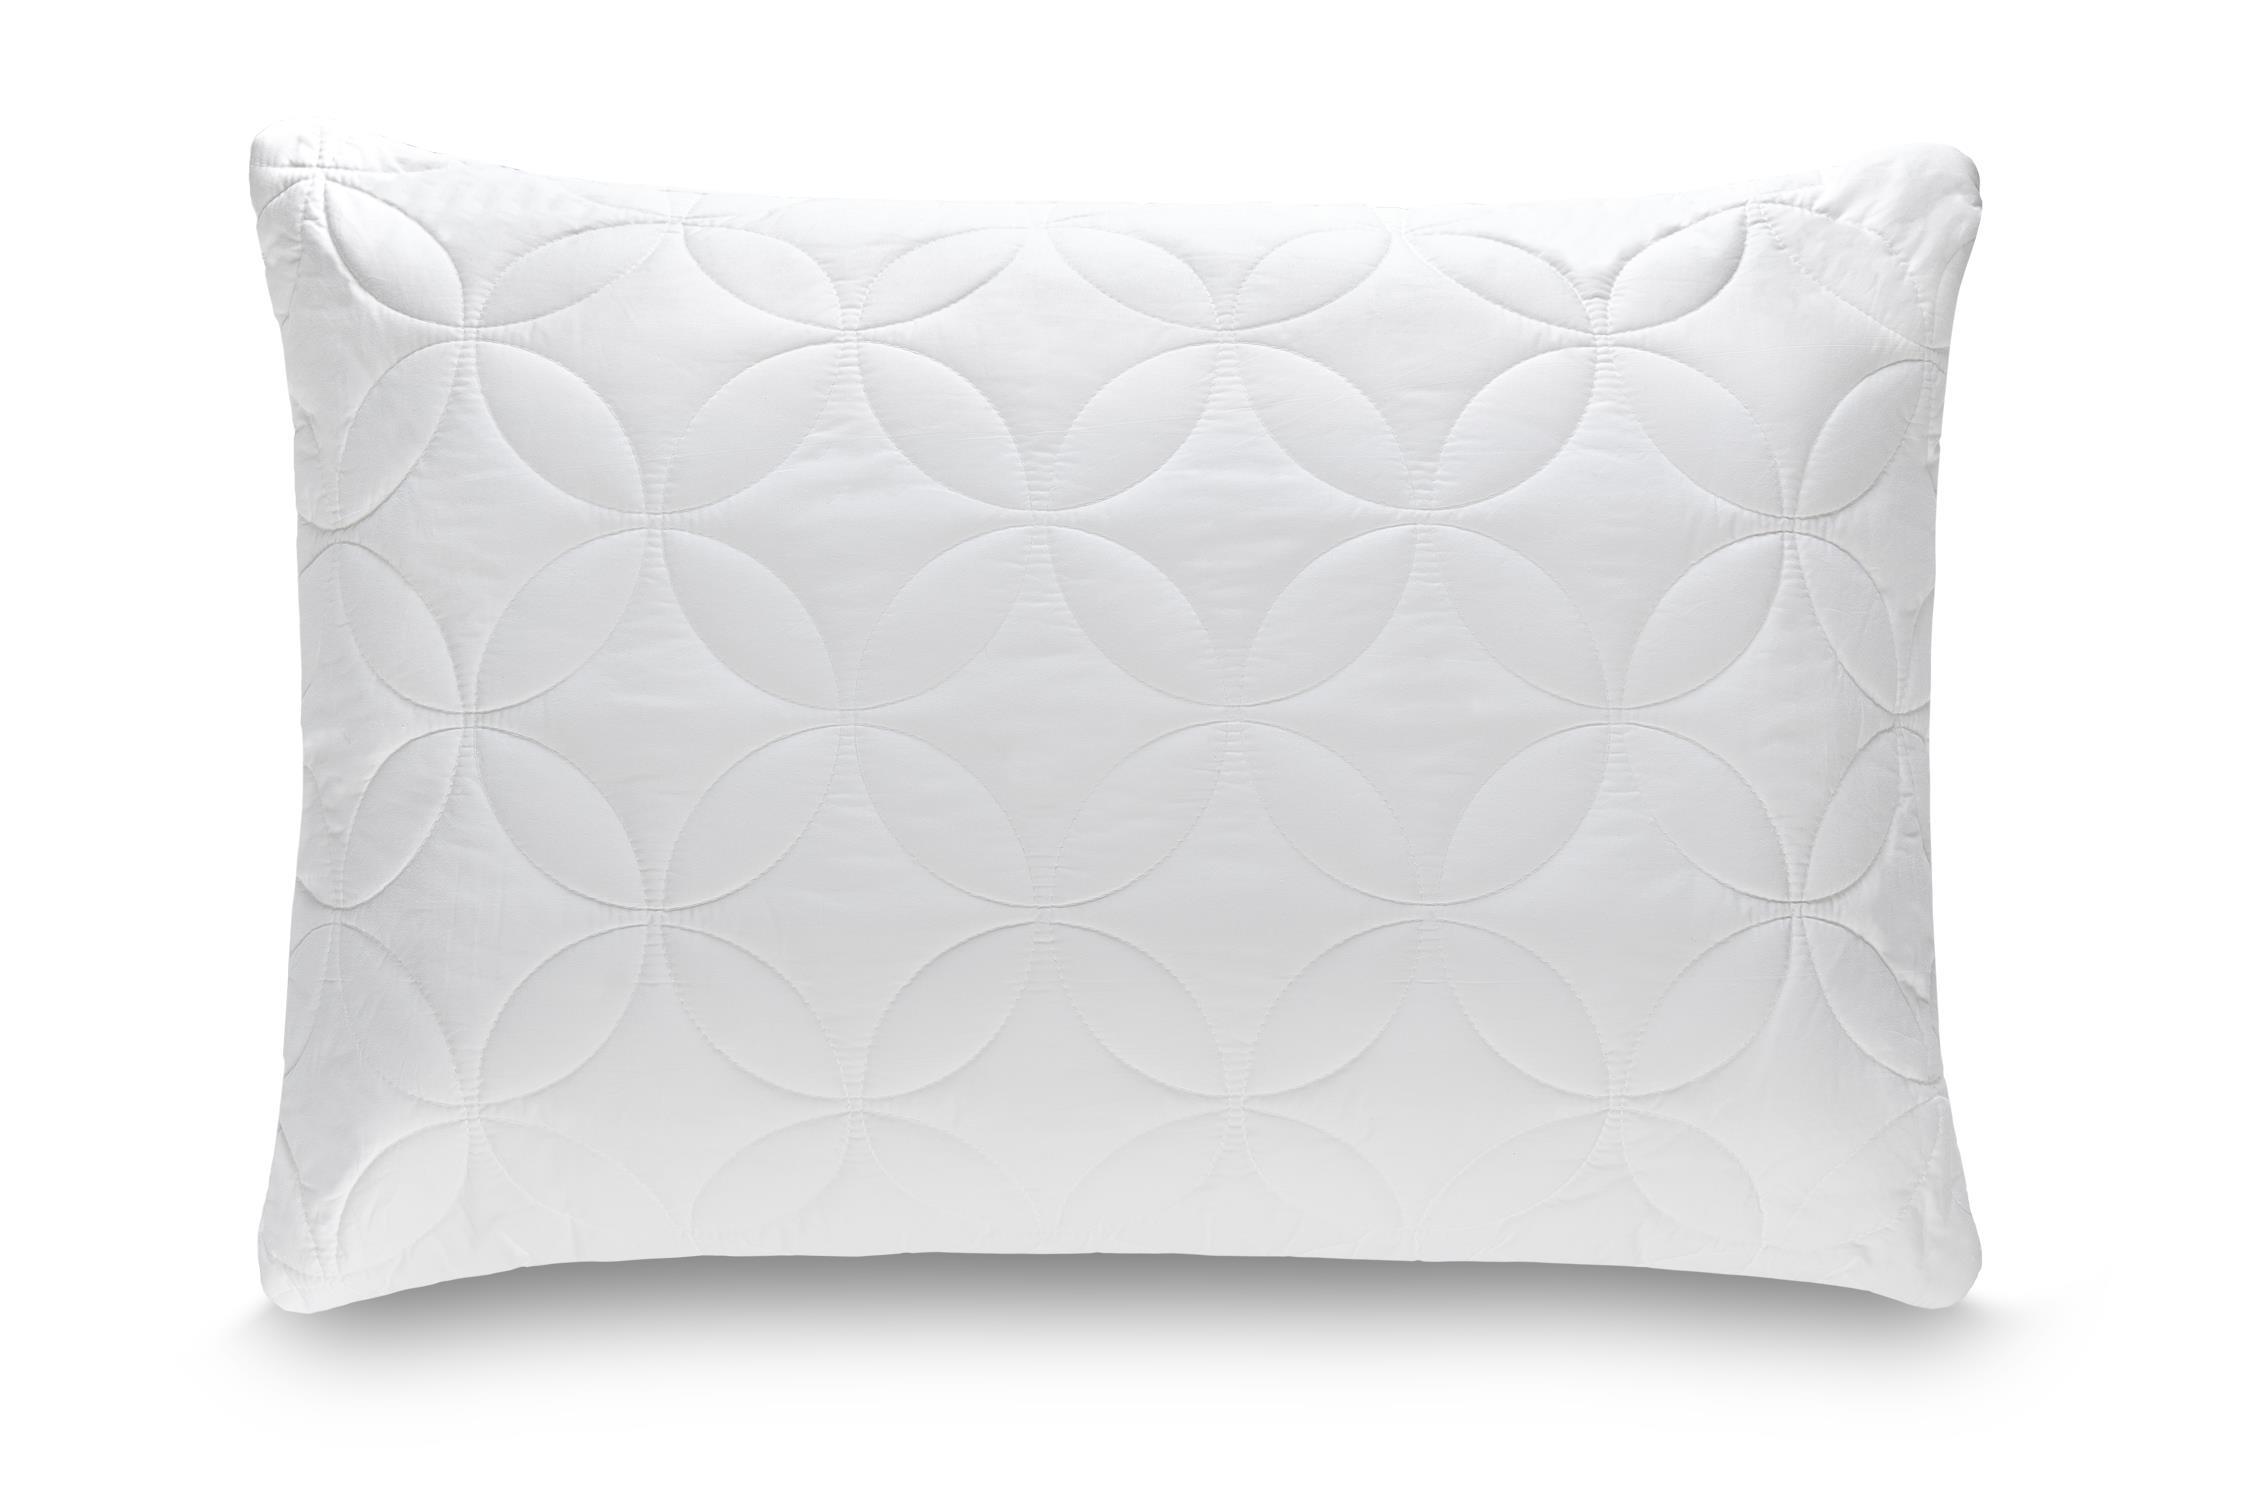 Tempur-Cloud Soft & Conforming Queen Pillow